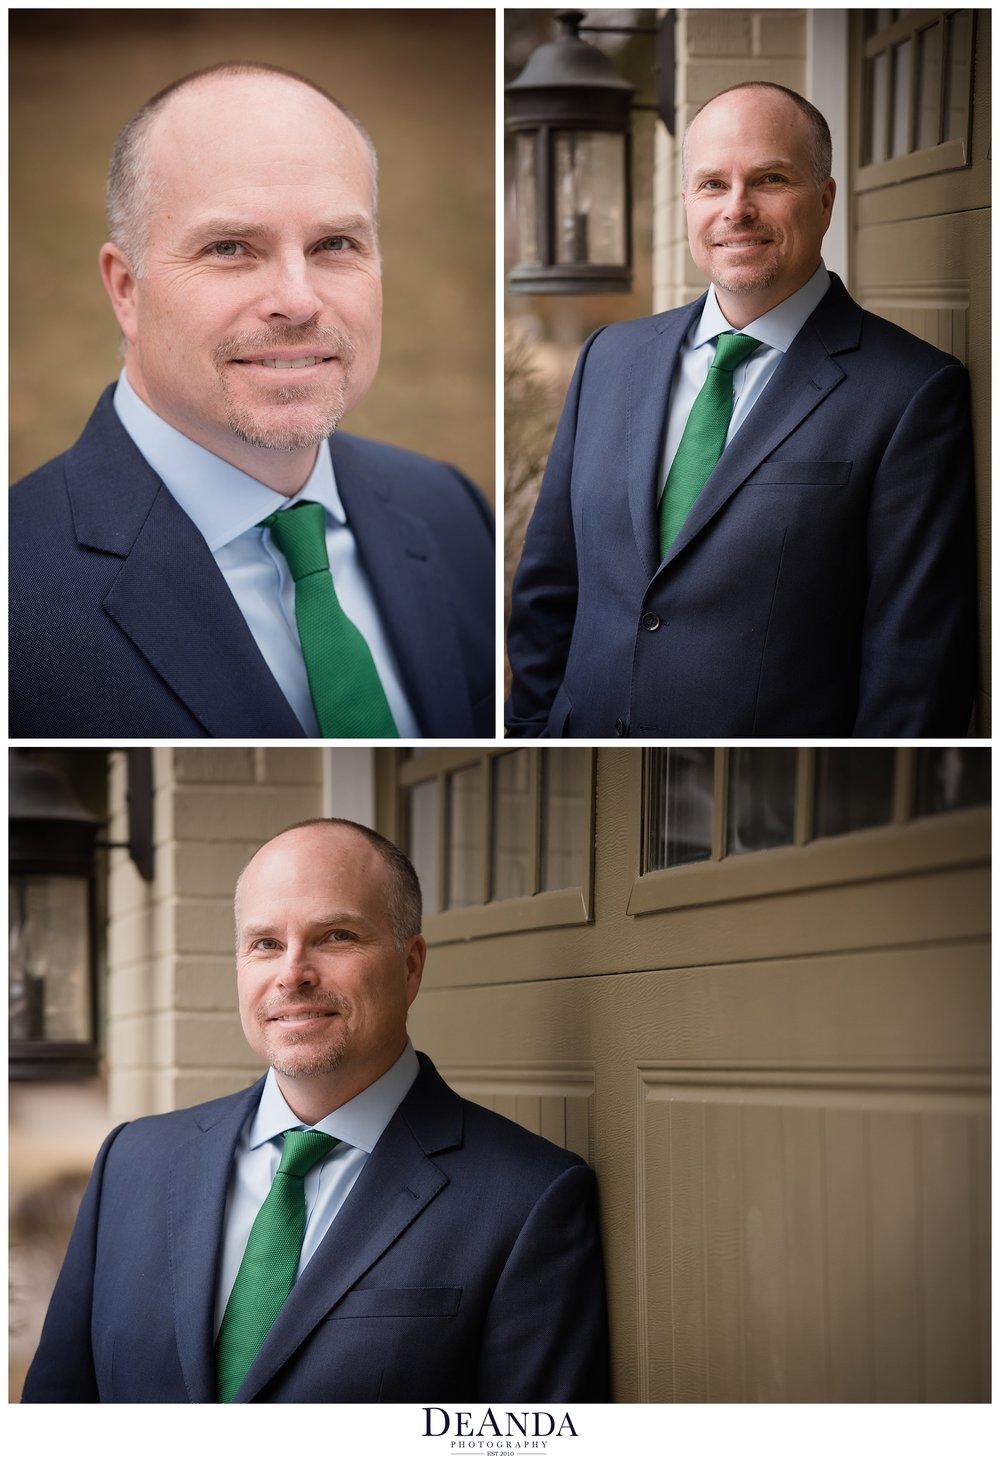 professional head shots of man